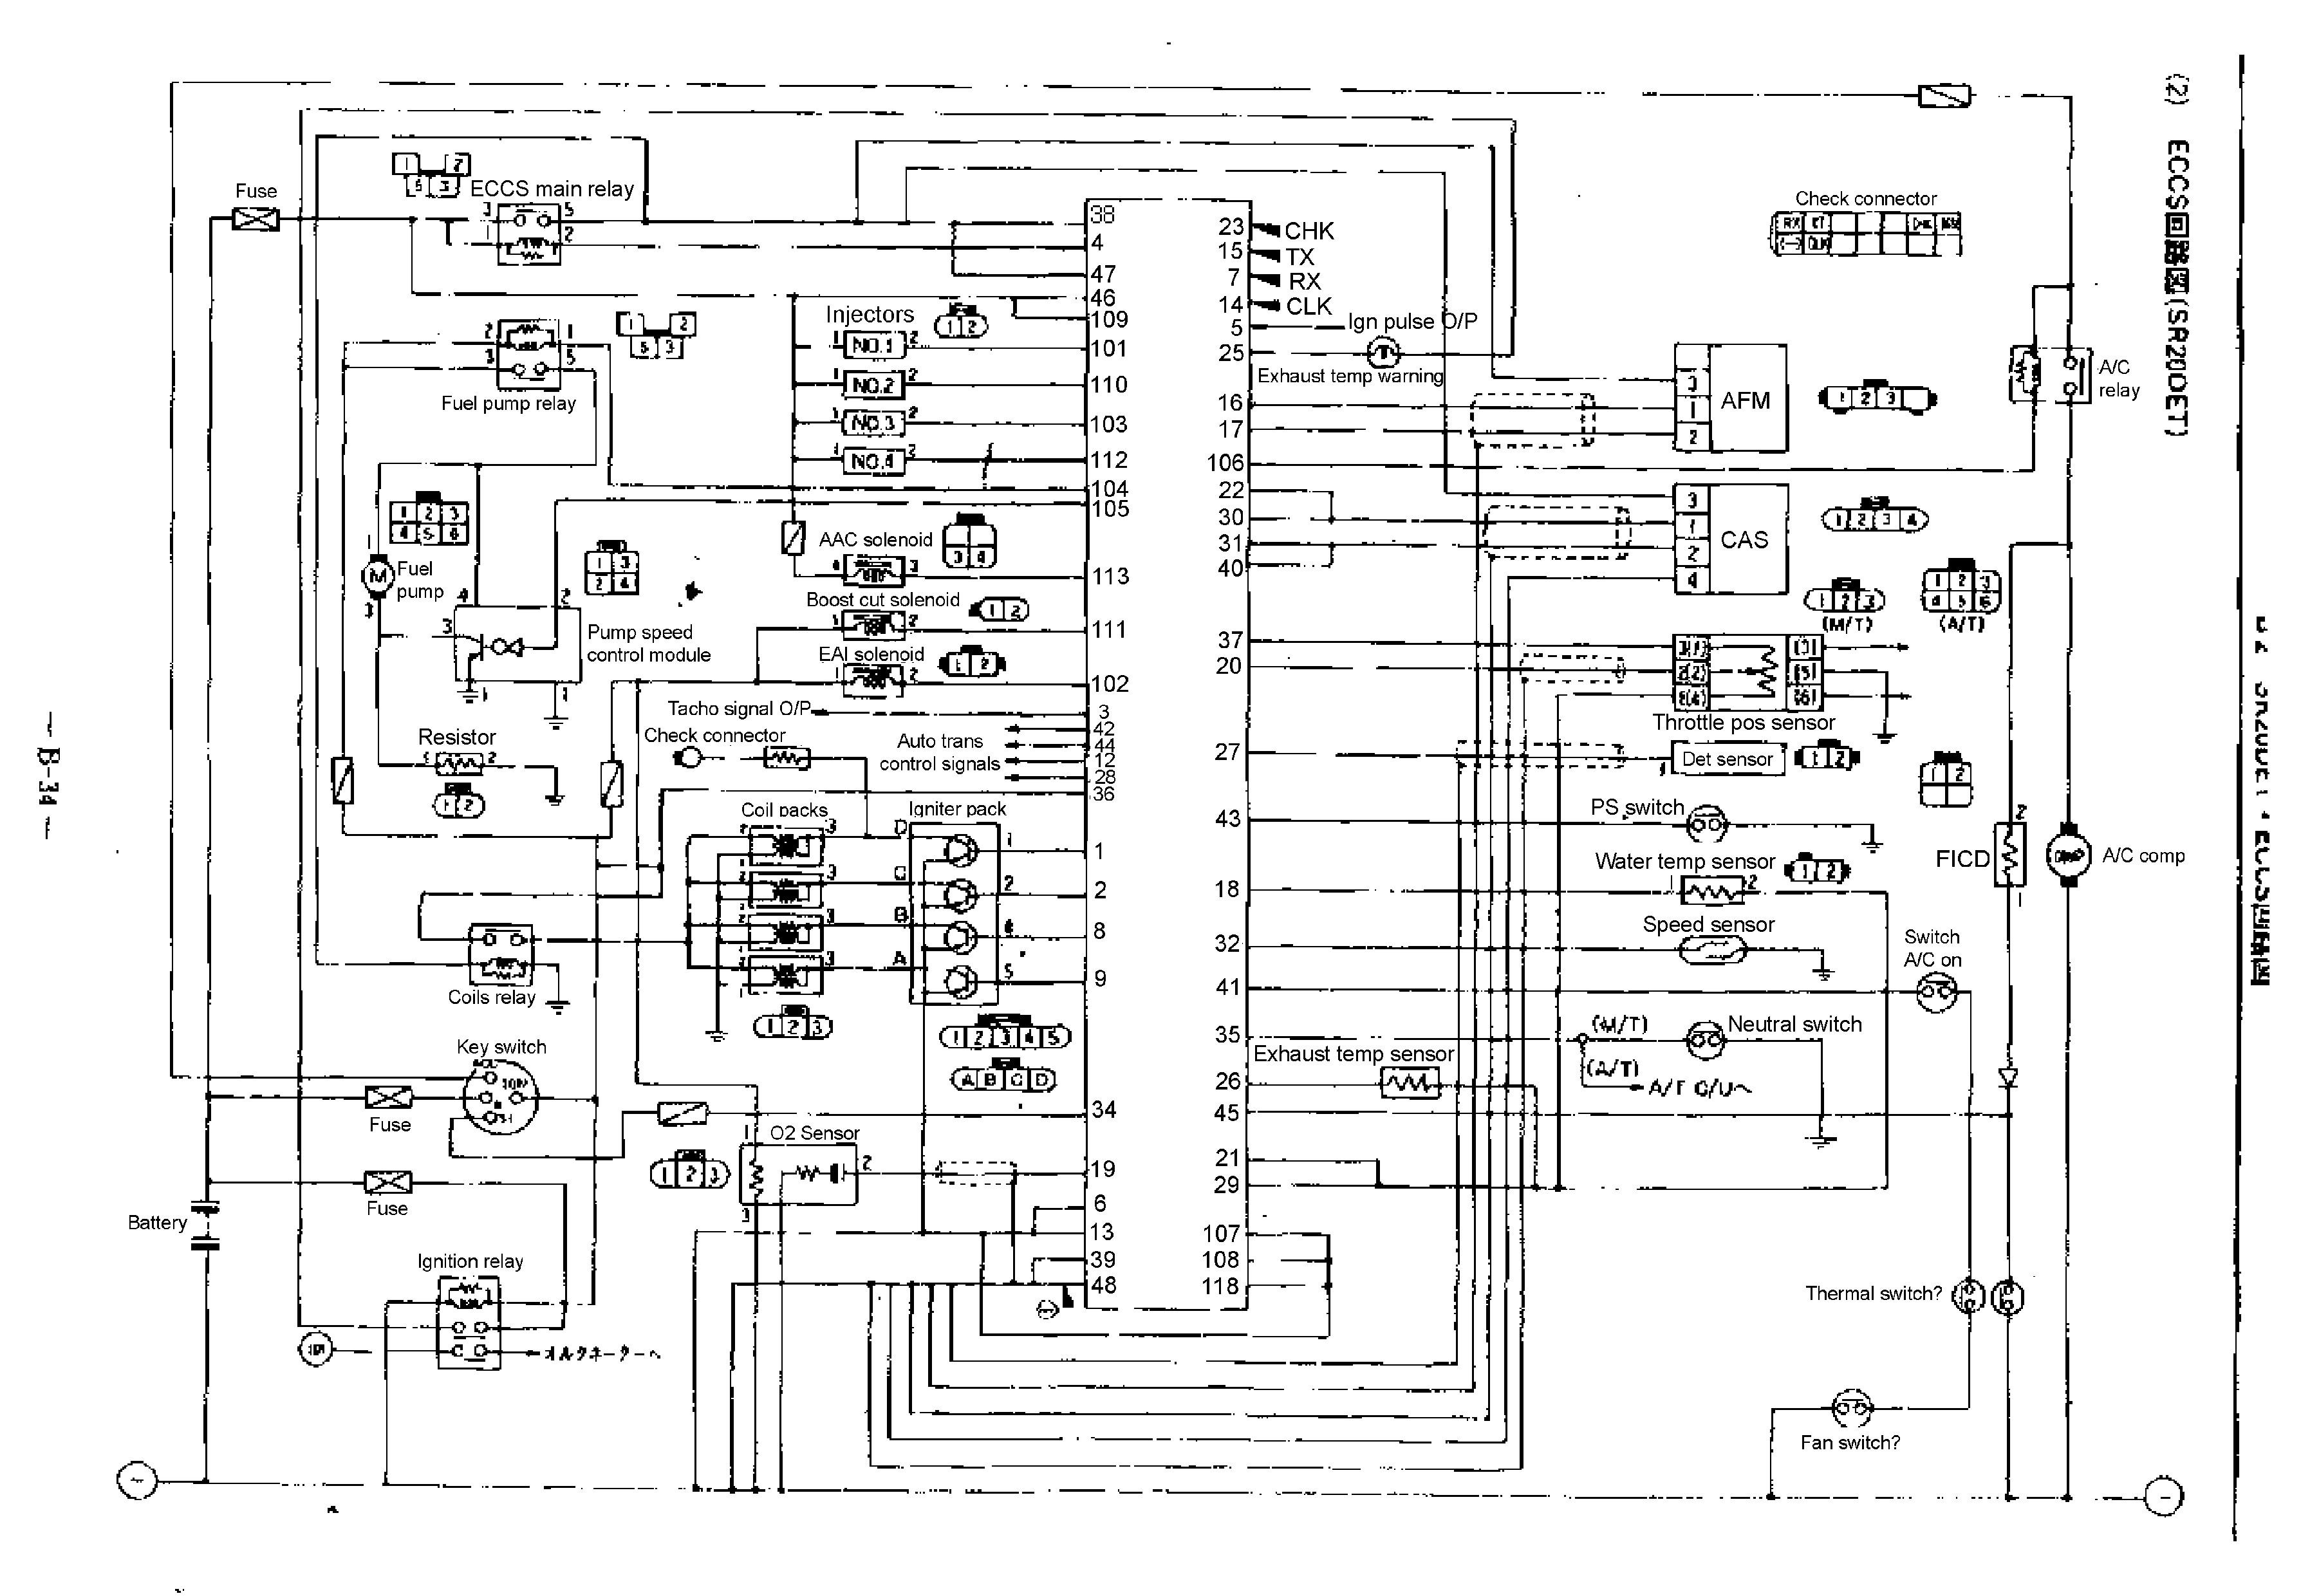 Daewoo Ac Wiring Diagram - N2 Wiring Diagram on